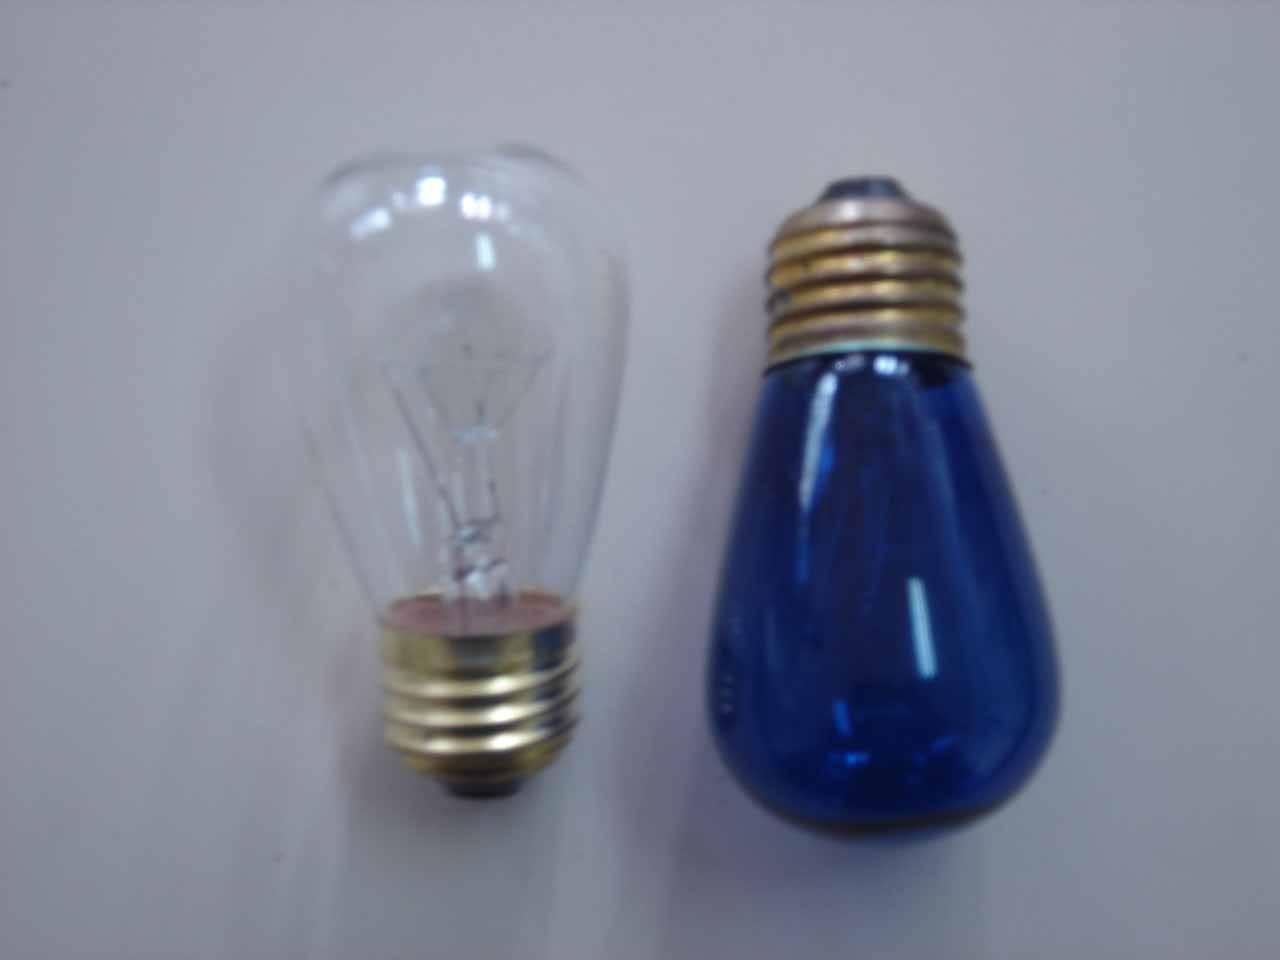 Pawpaw lamp